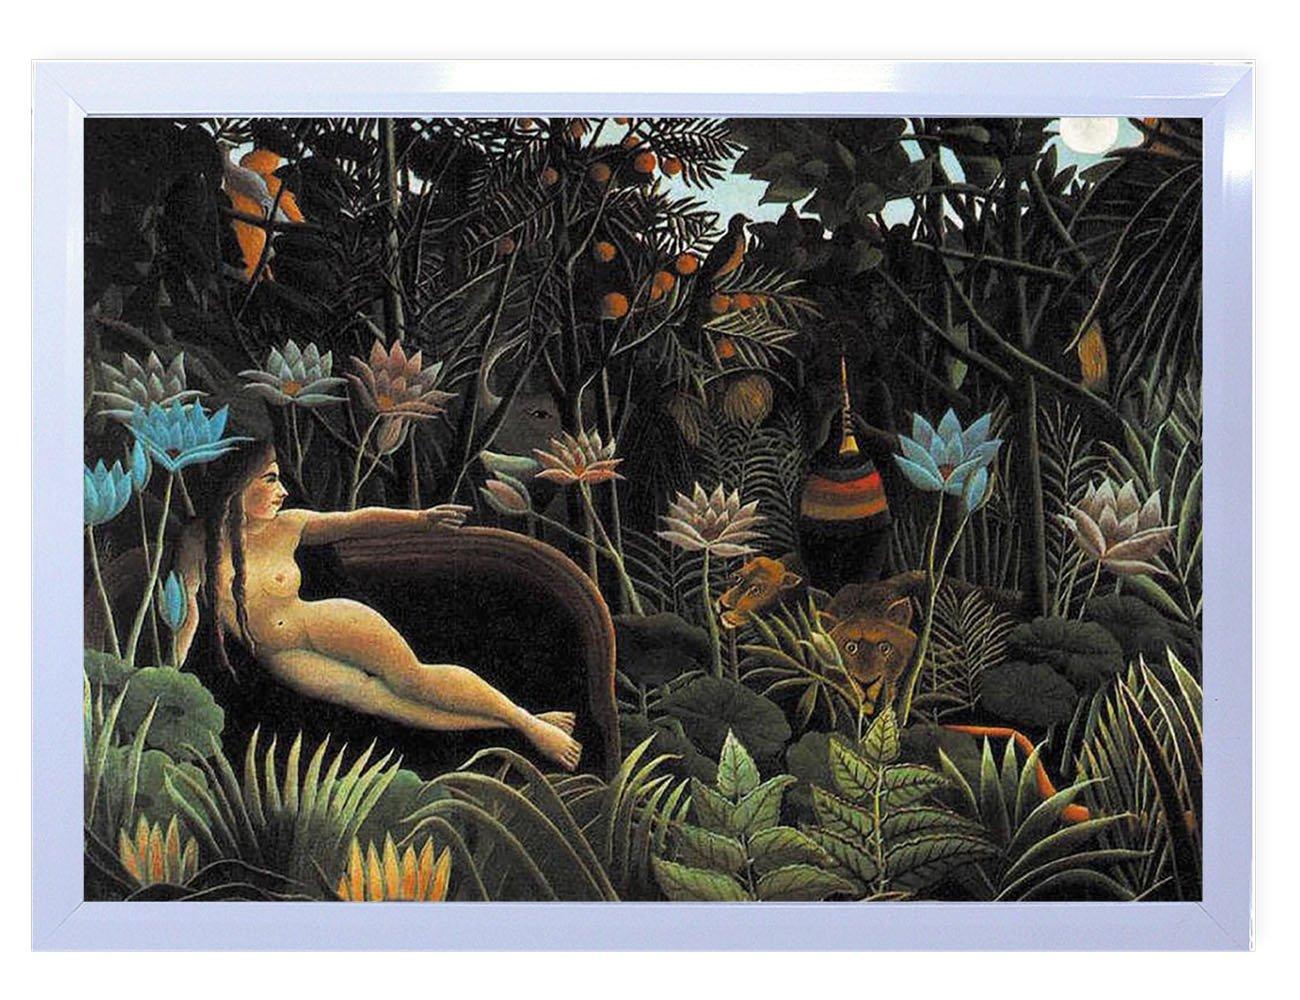 【DXポスター】ヒシャン=シャックルソーのアートポスター フレーム付きJean-Jacques RousseauP-A1-FIN-ROUS-0002-wh P-A1-FIN-ROUS-0002-wh B073SH49GZ A1サイズ(84.1cm×59.4cm)+ホワイトフレーム A1サイズ(84.1cm×59.4cm)+ホワイトフレーム